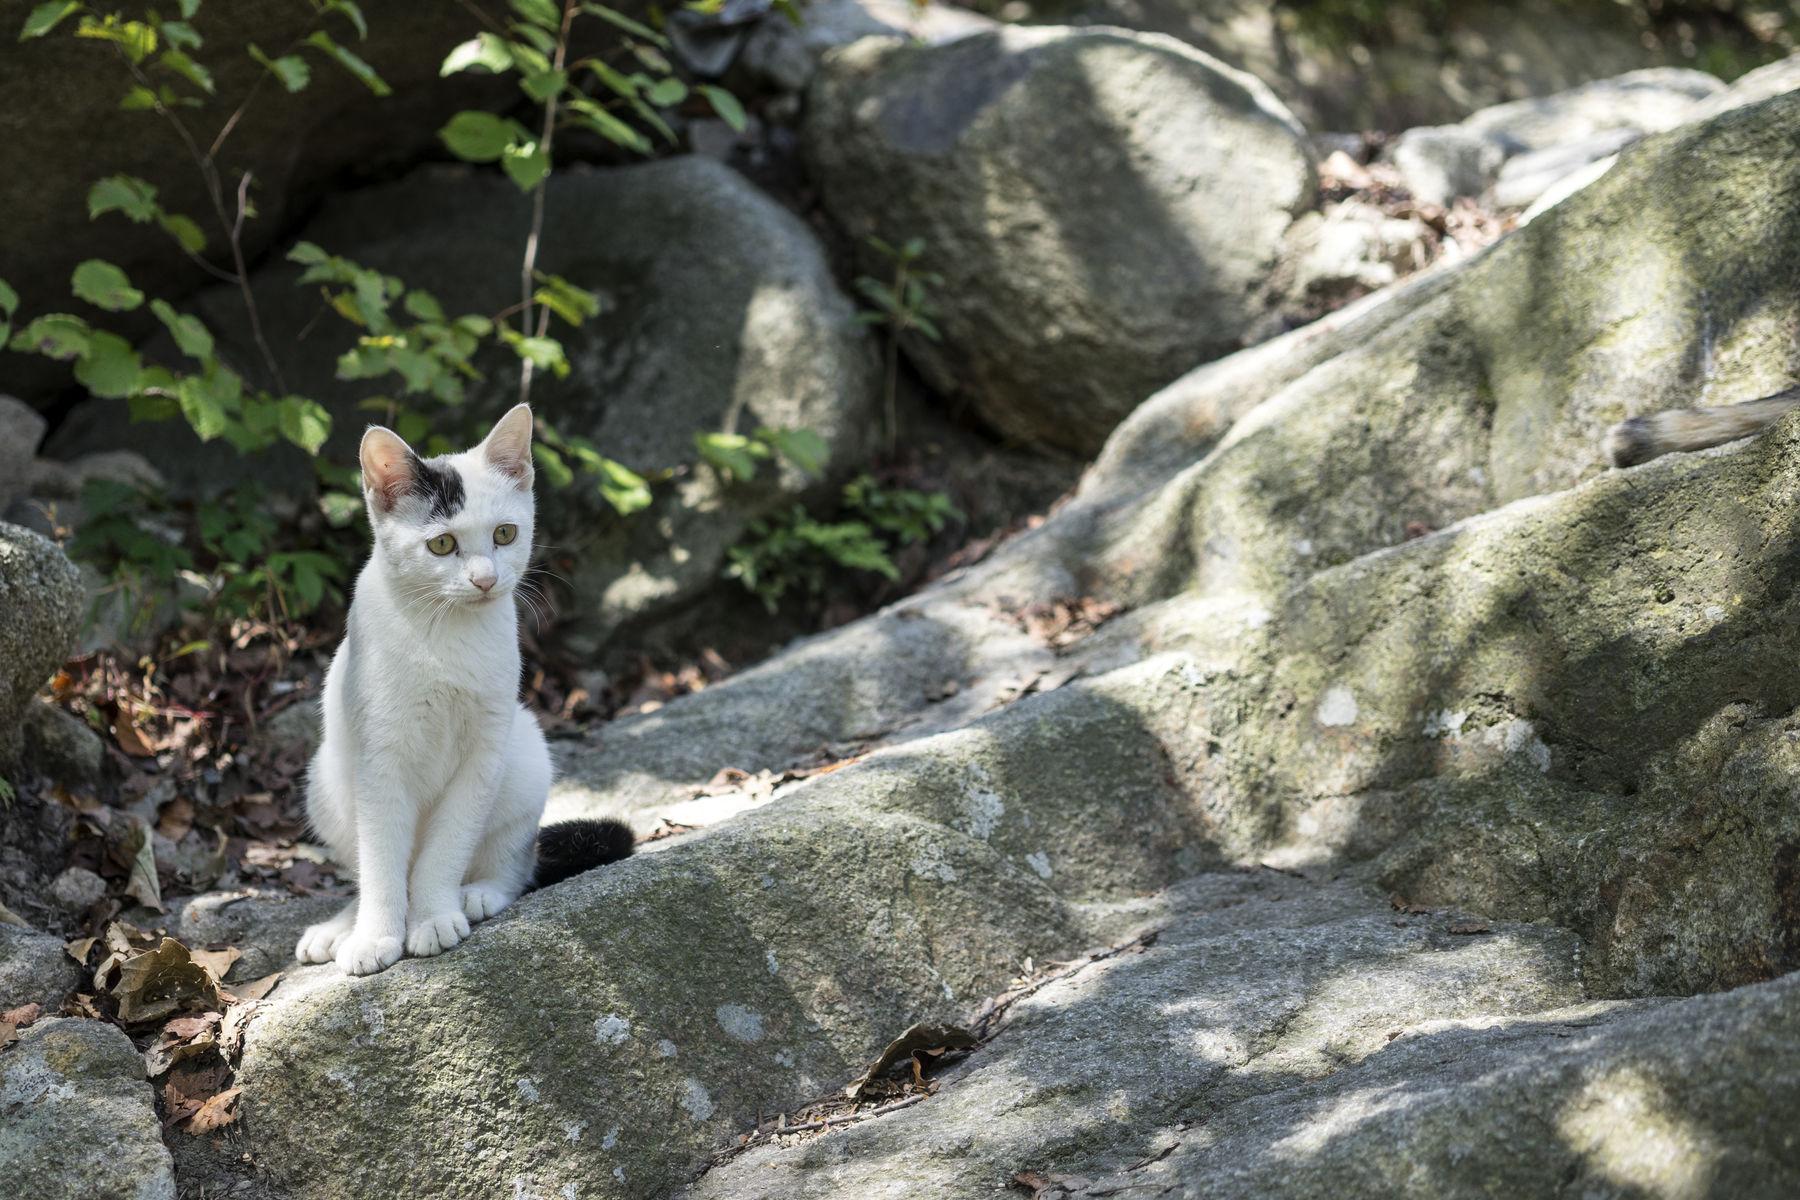 Kittens in the mountain Kittens Cat Nature Mountain Seoul_korea